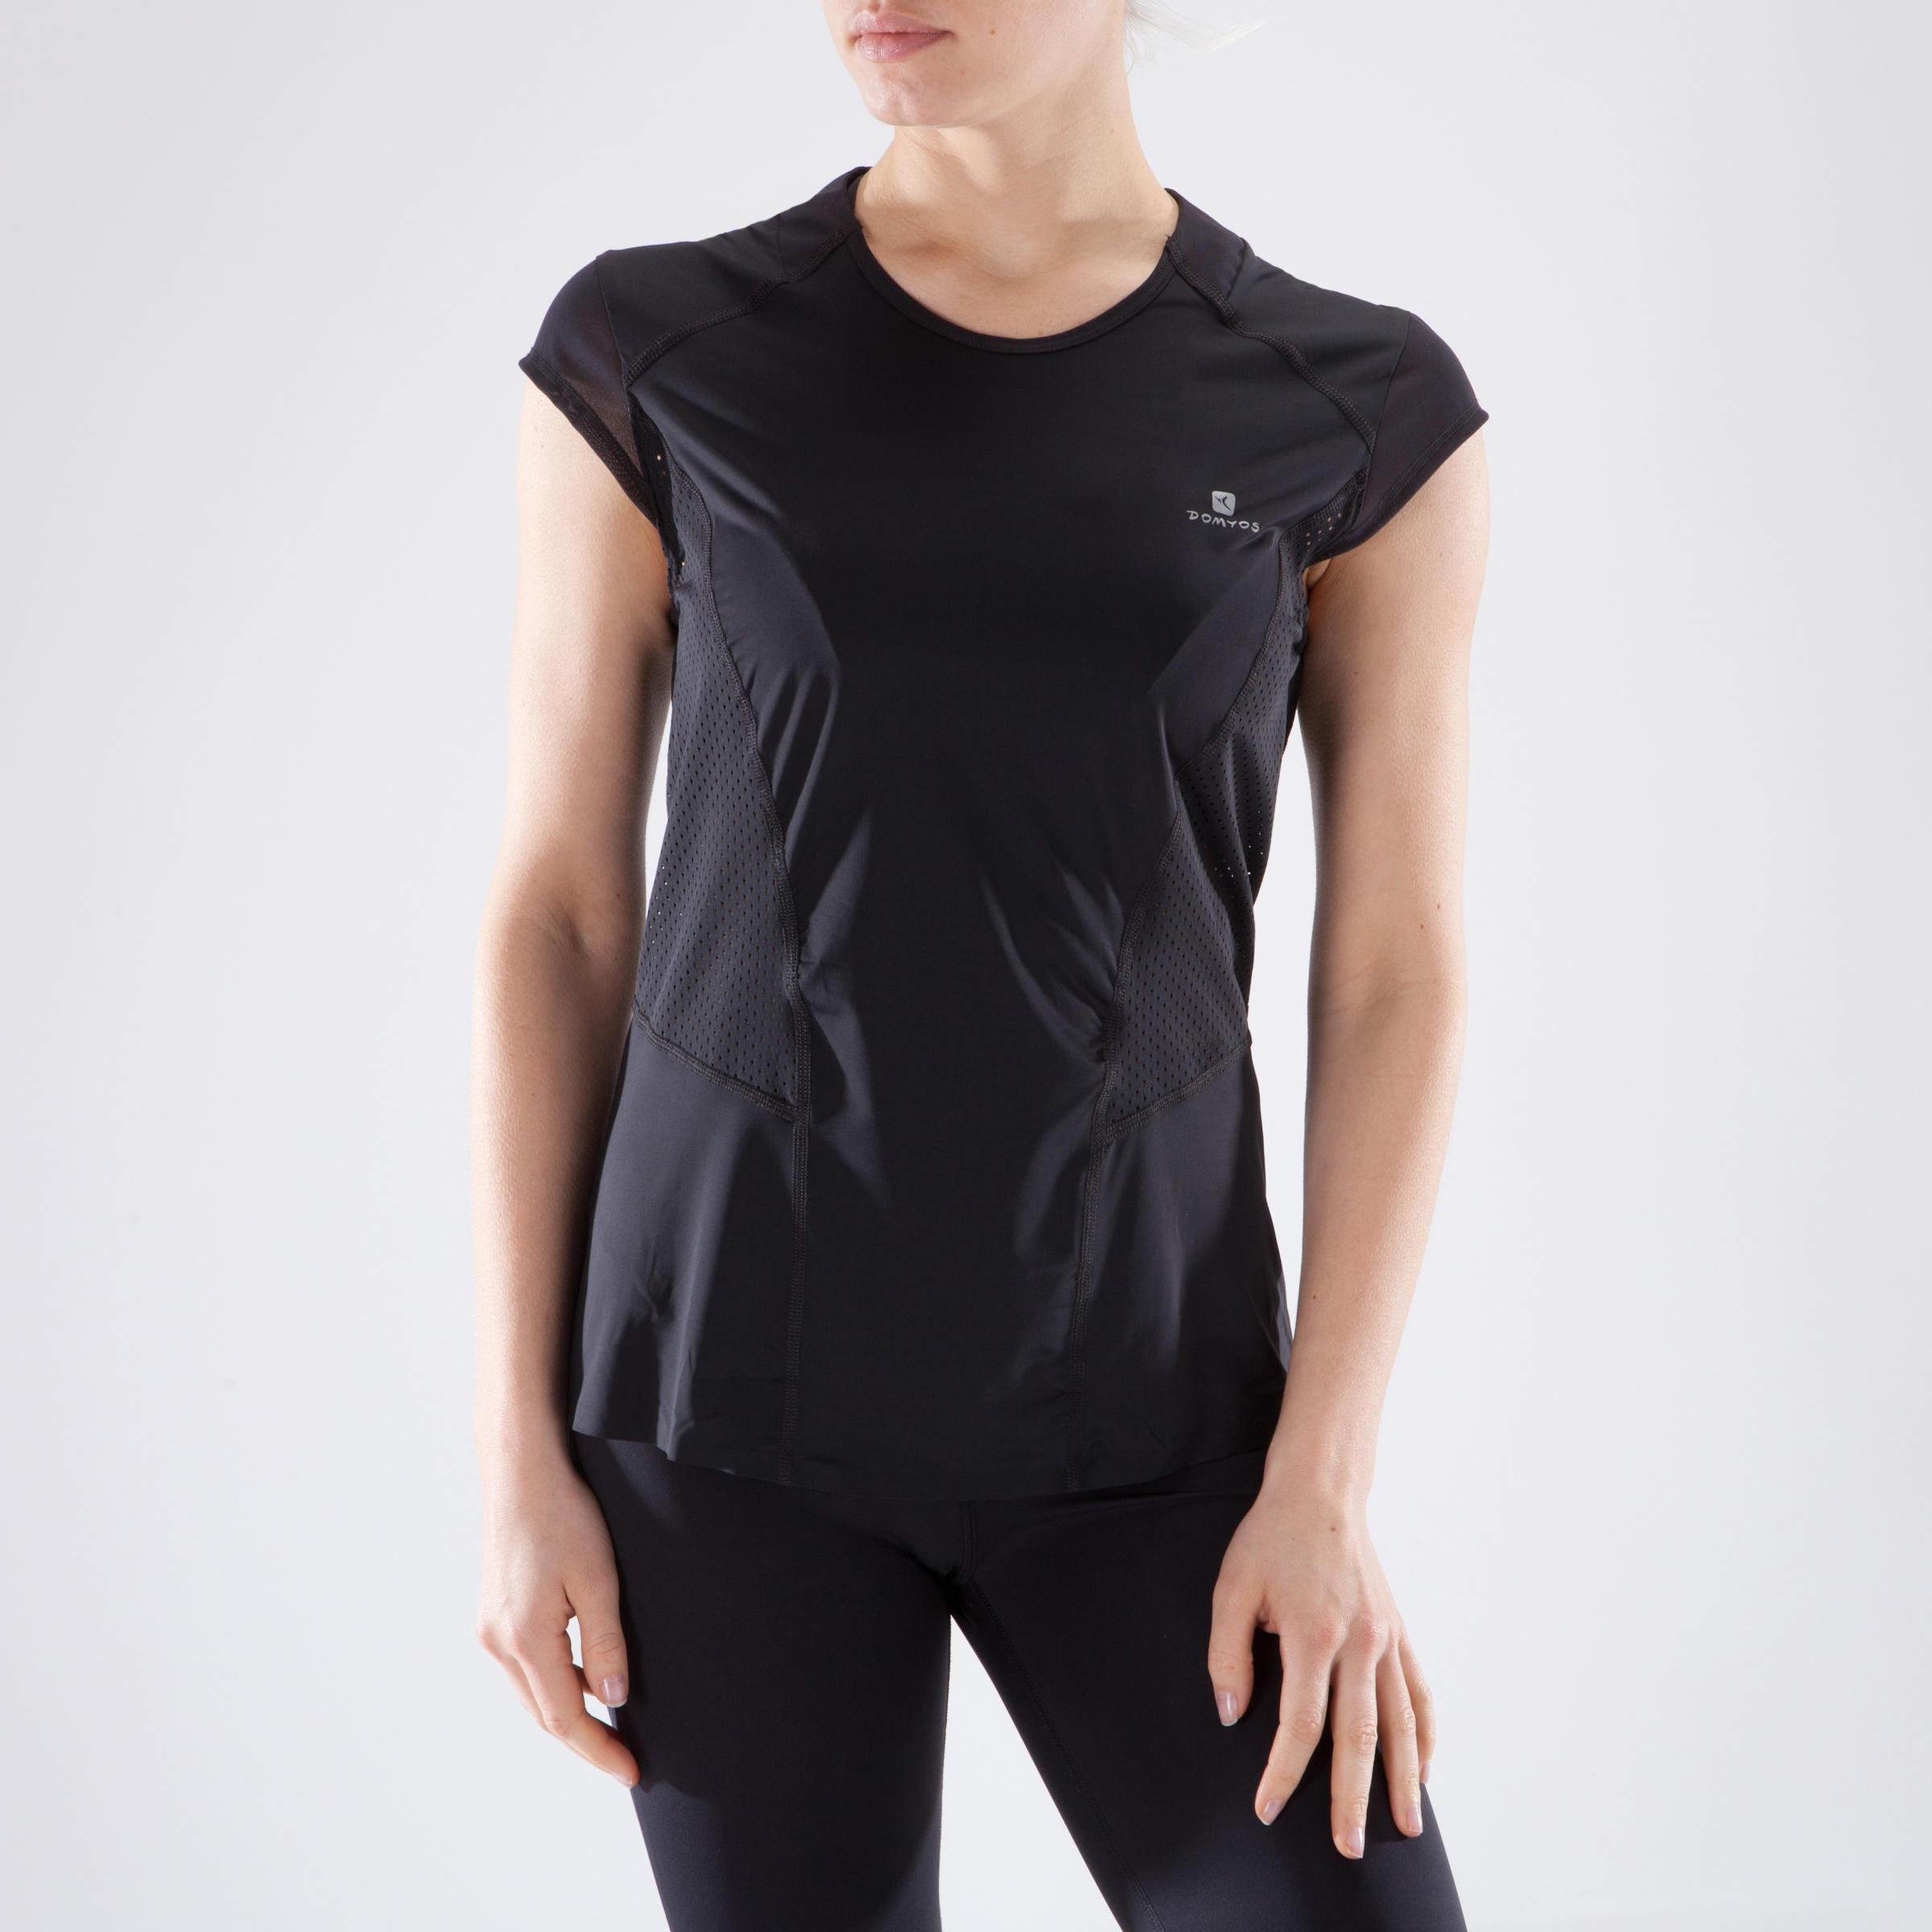 900 Women's Cardio Fitness T-Shirt - Black